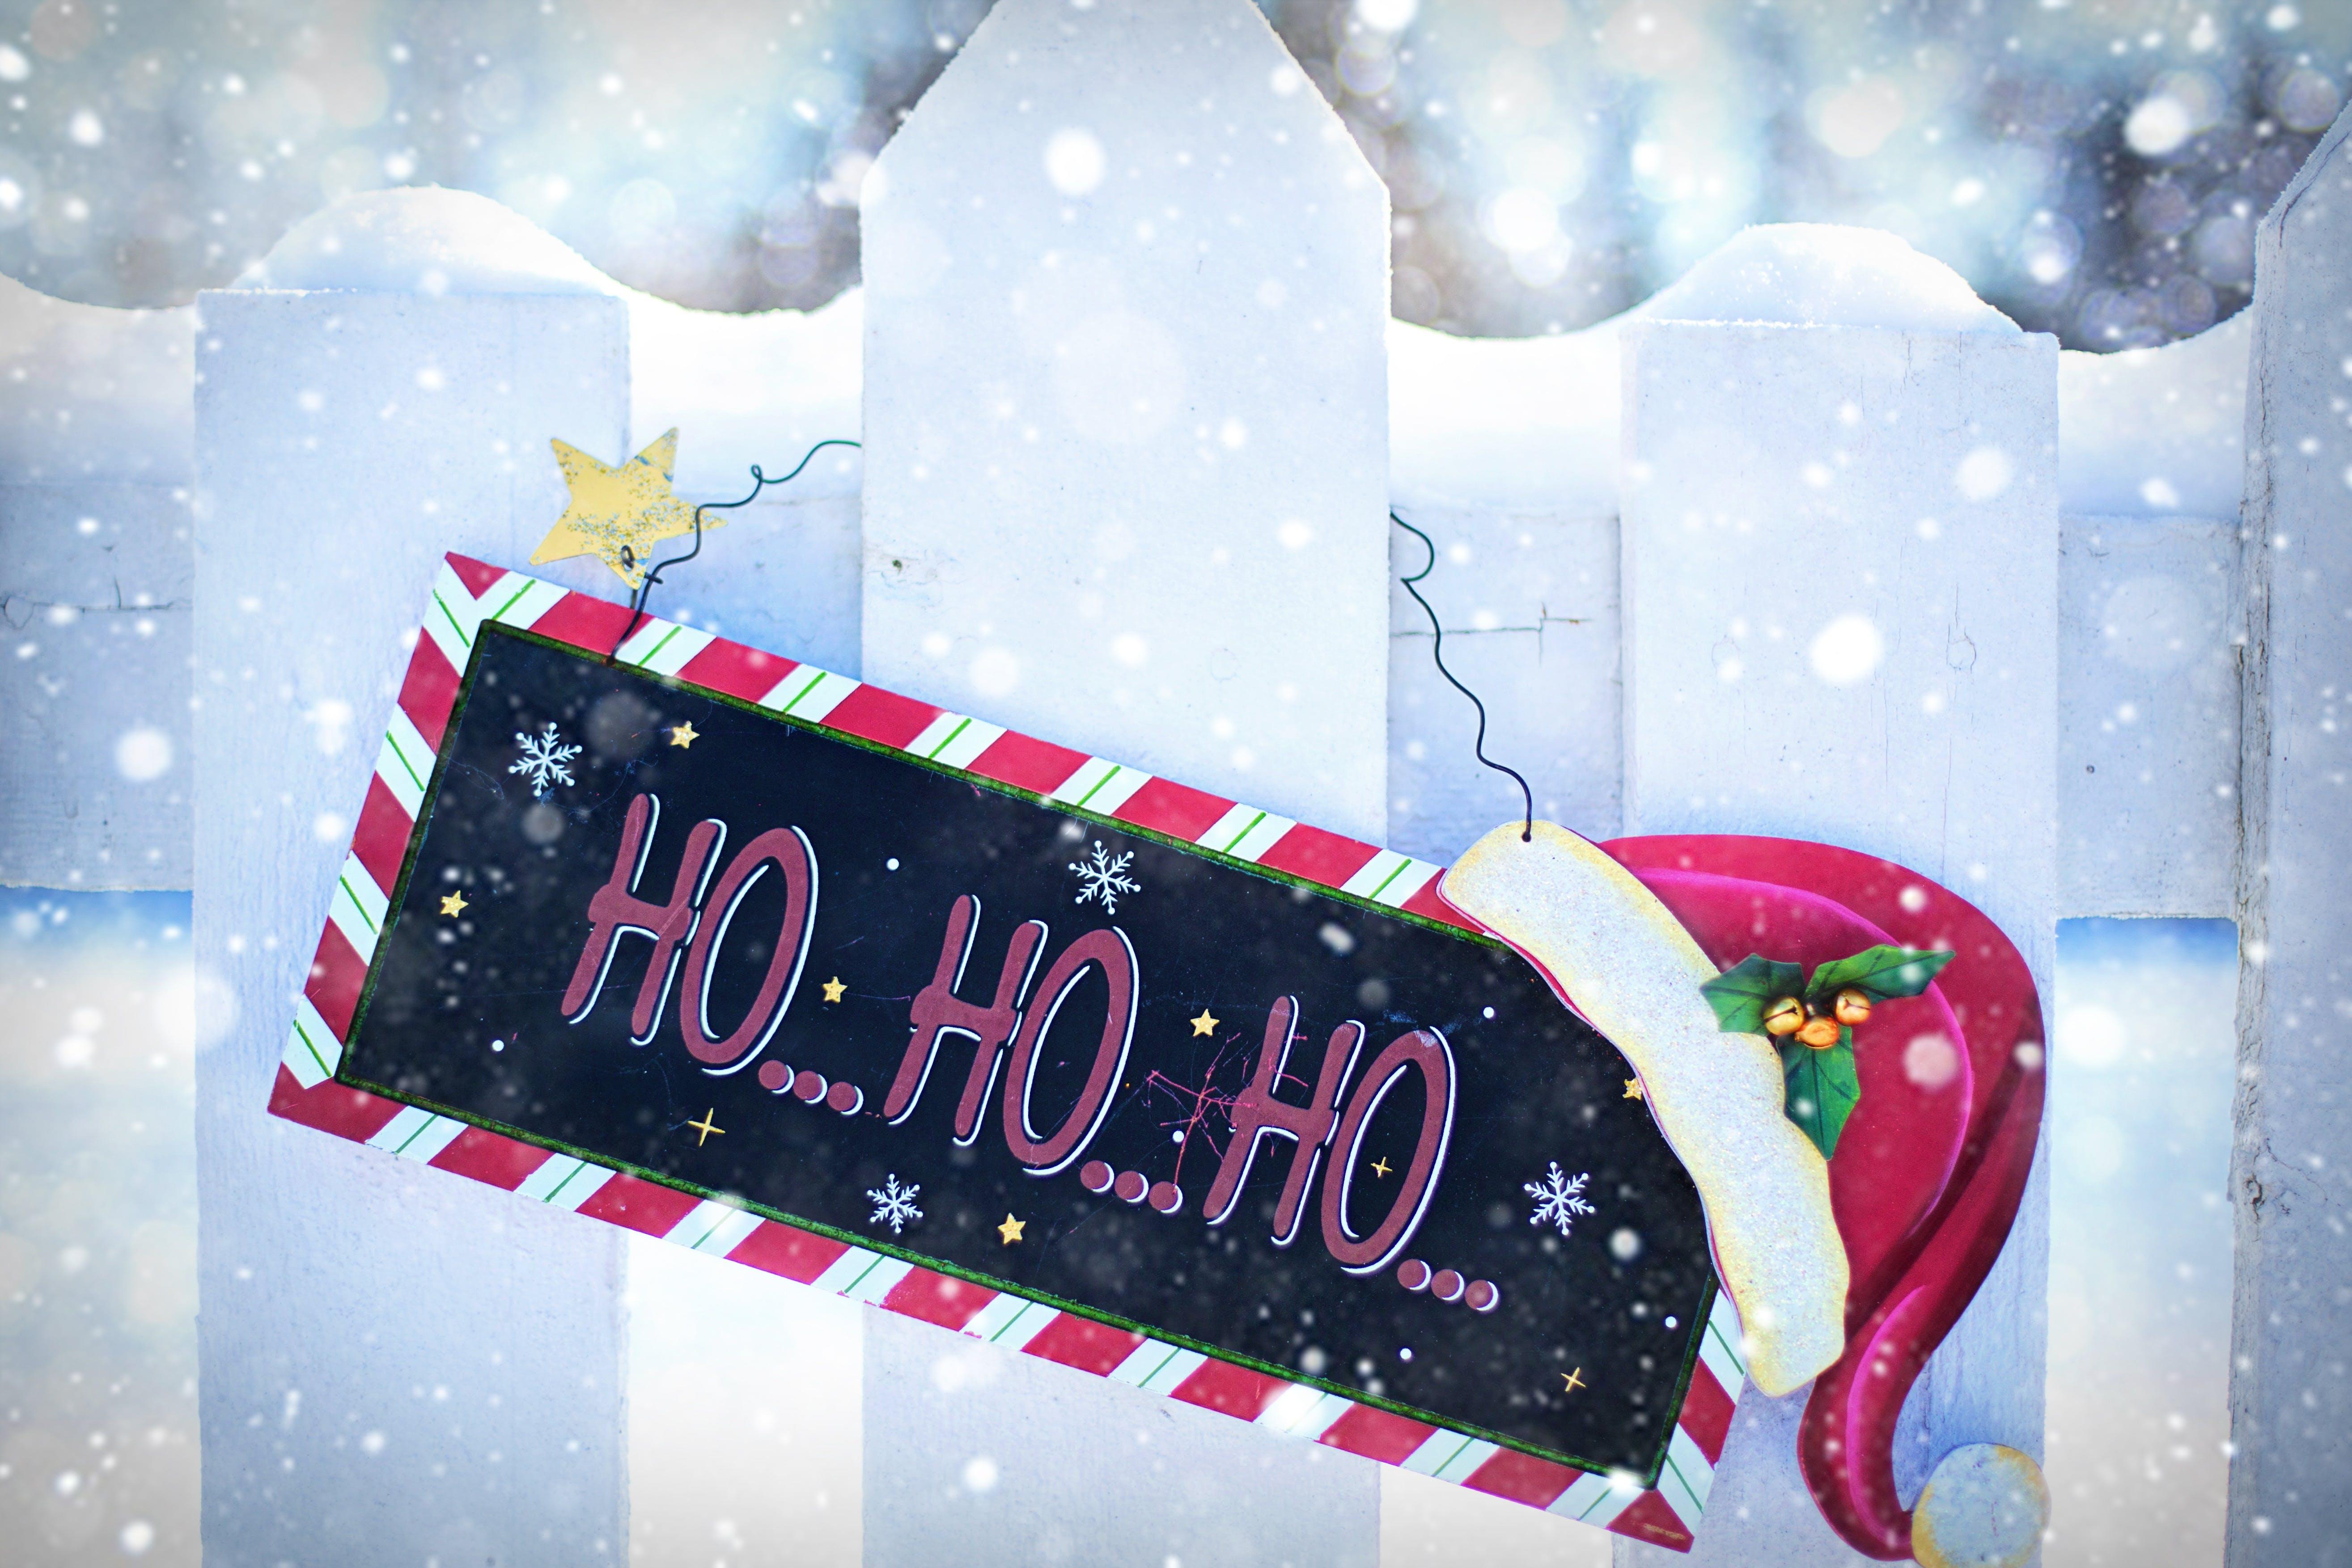 Free stock photo of holiday, winter, design, decoration